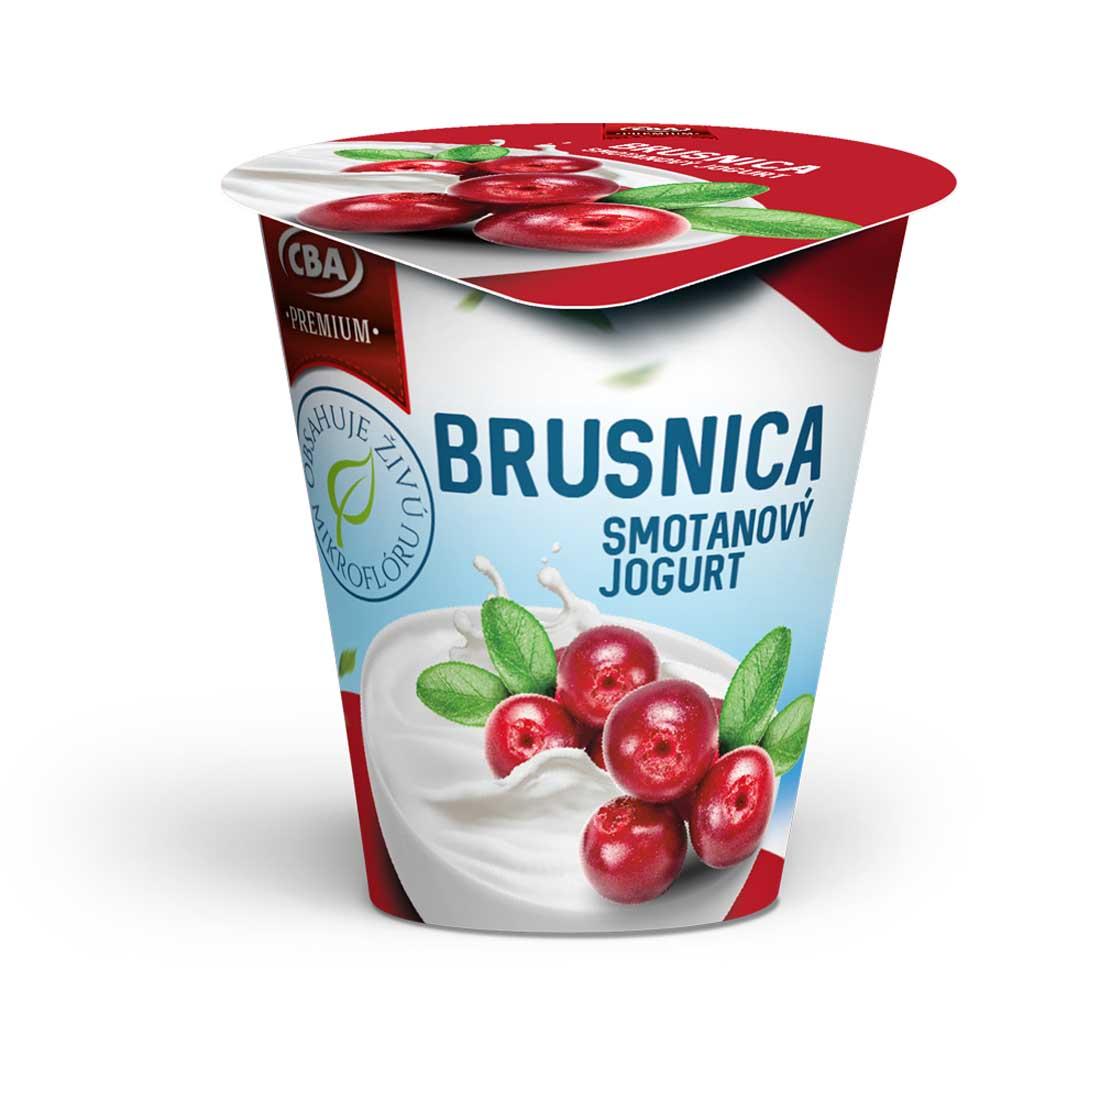 CBA Premium smotanový jogurt brusnicový 145 g